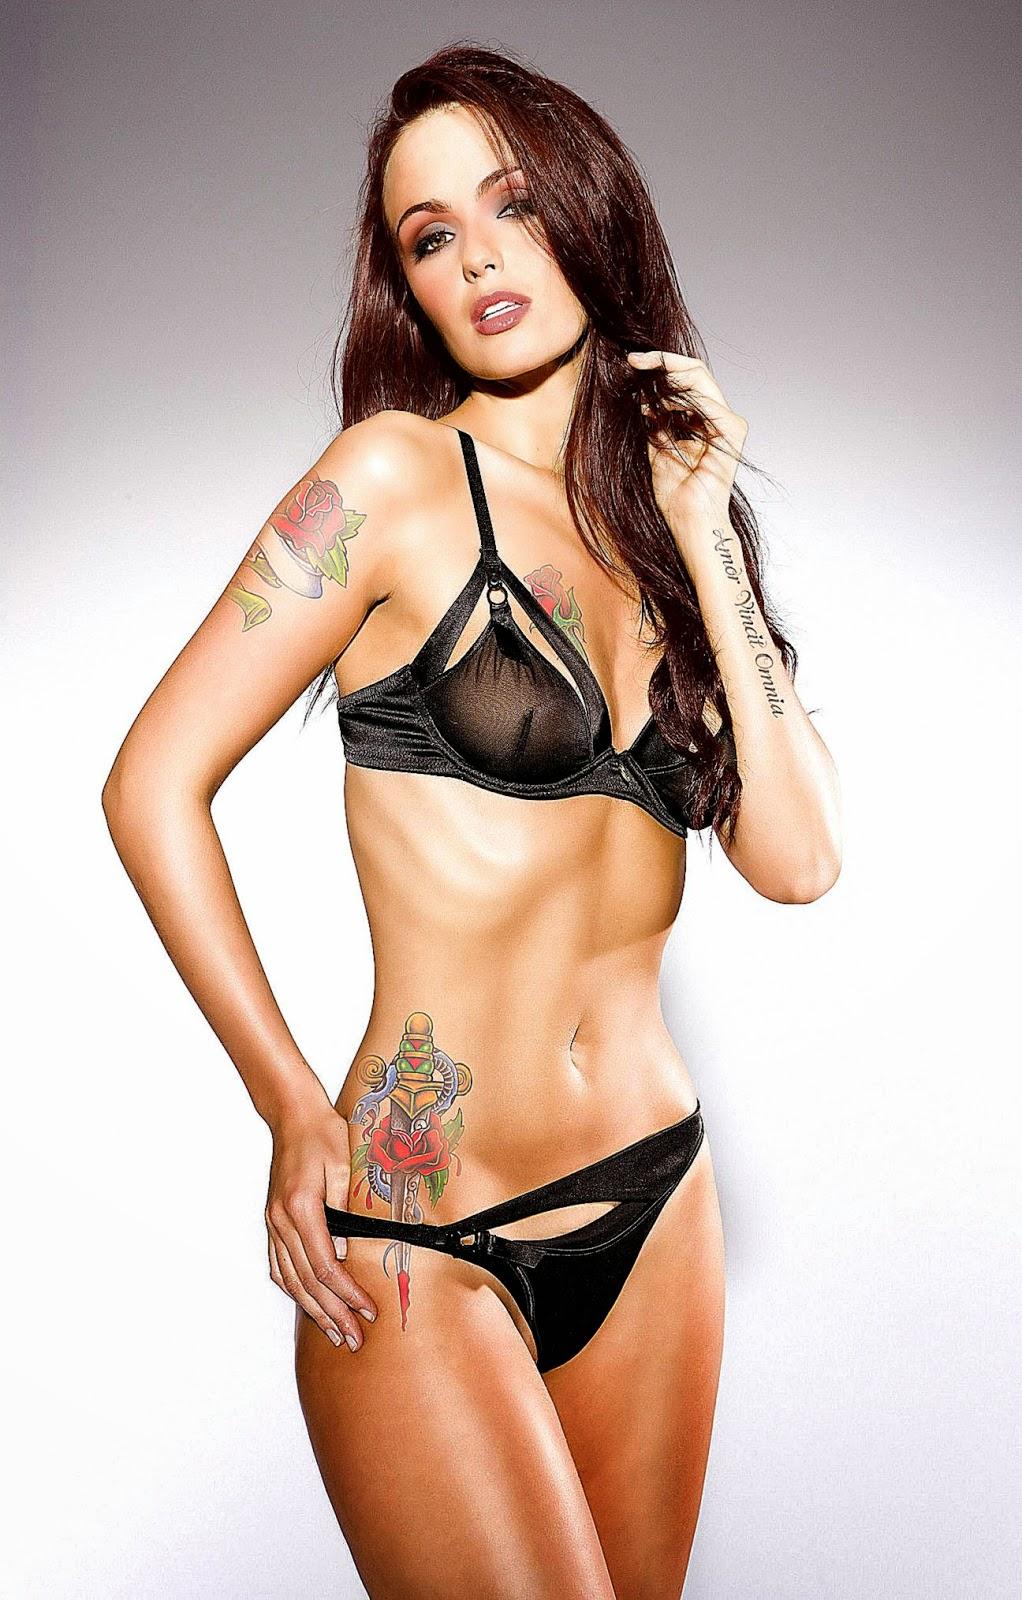 Full Body Art Body Art And Painting